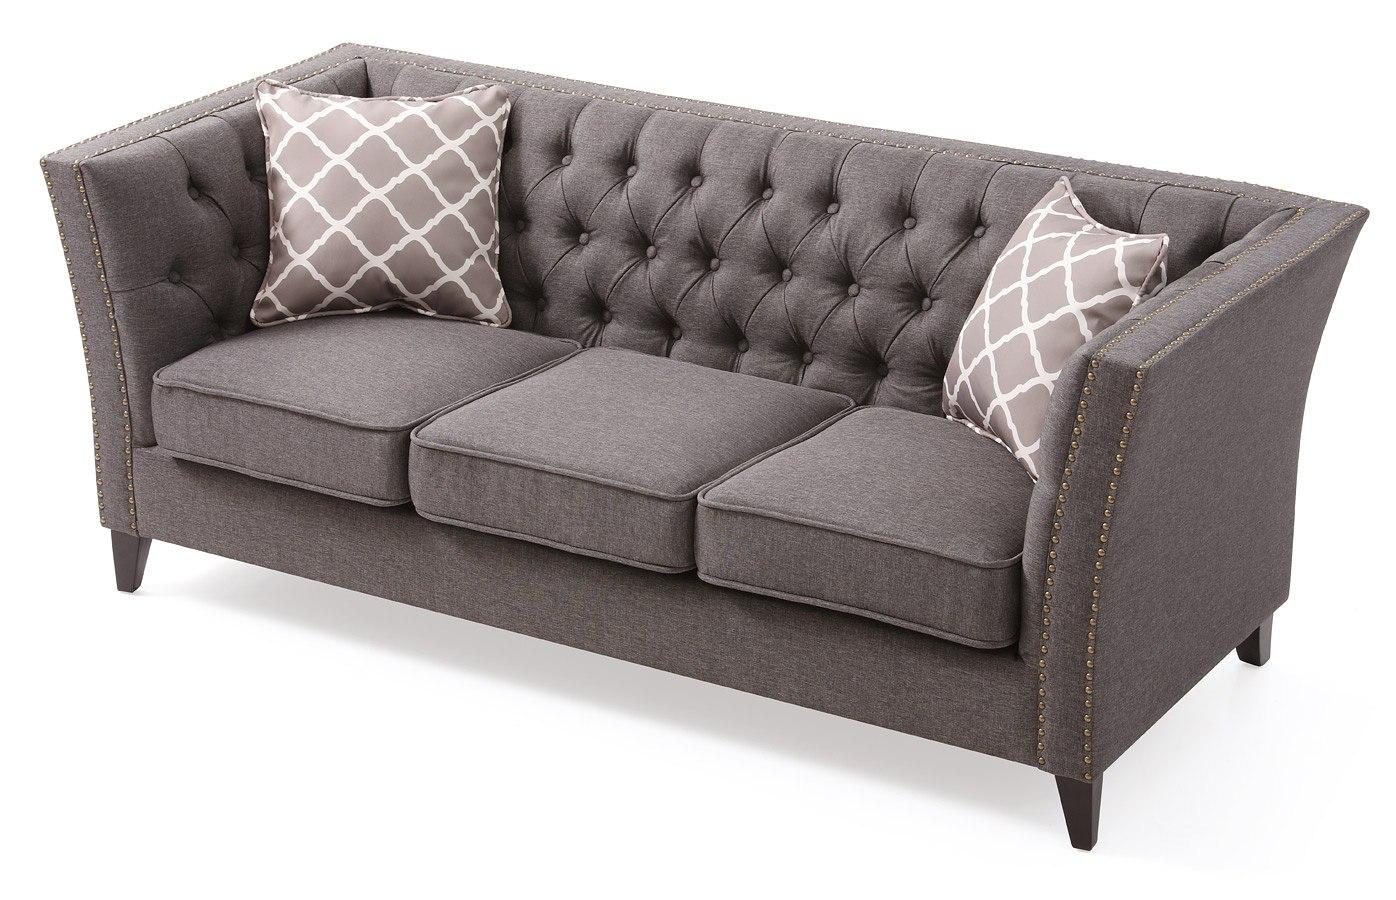 Pleasant Flair Sofa Gray Pabps2019 Chair Design Images Pabps2019Com